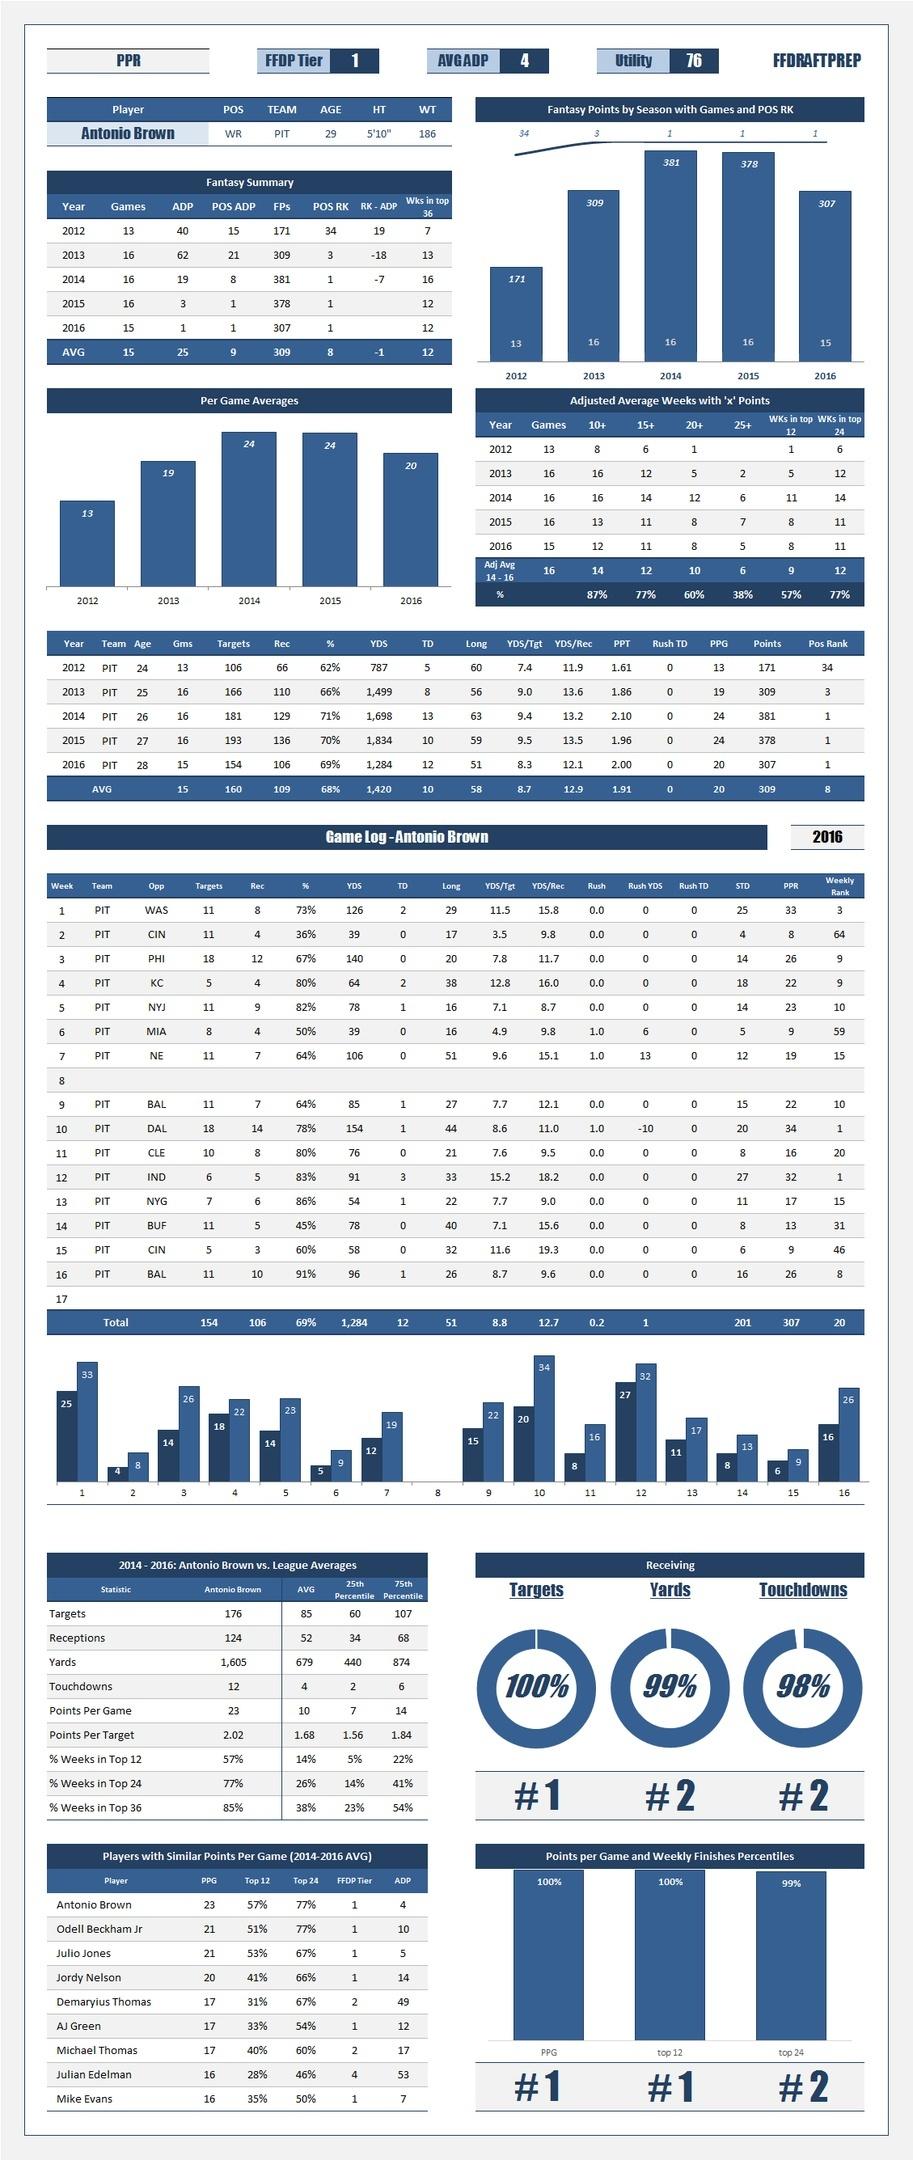 2017 FFDraftPrep Research Tool